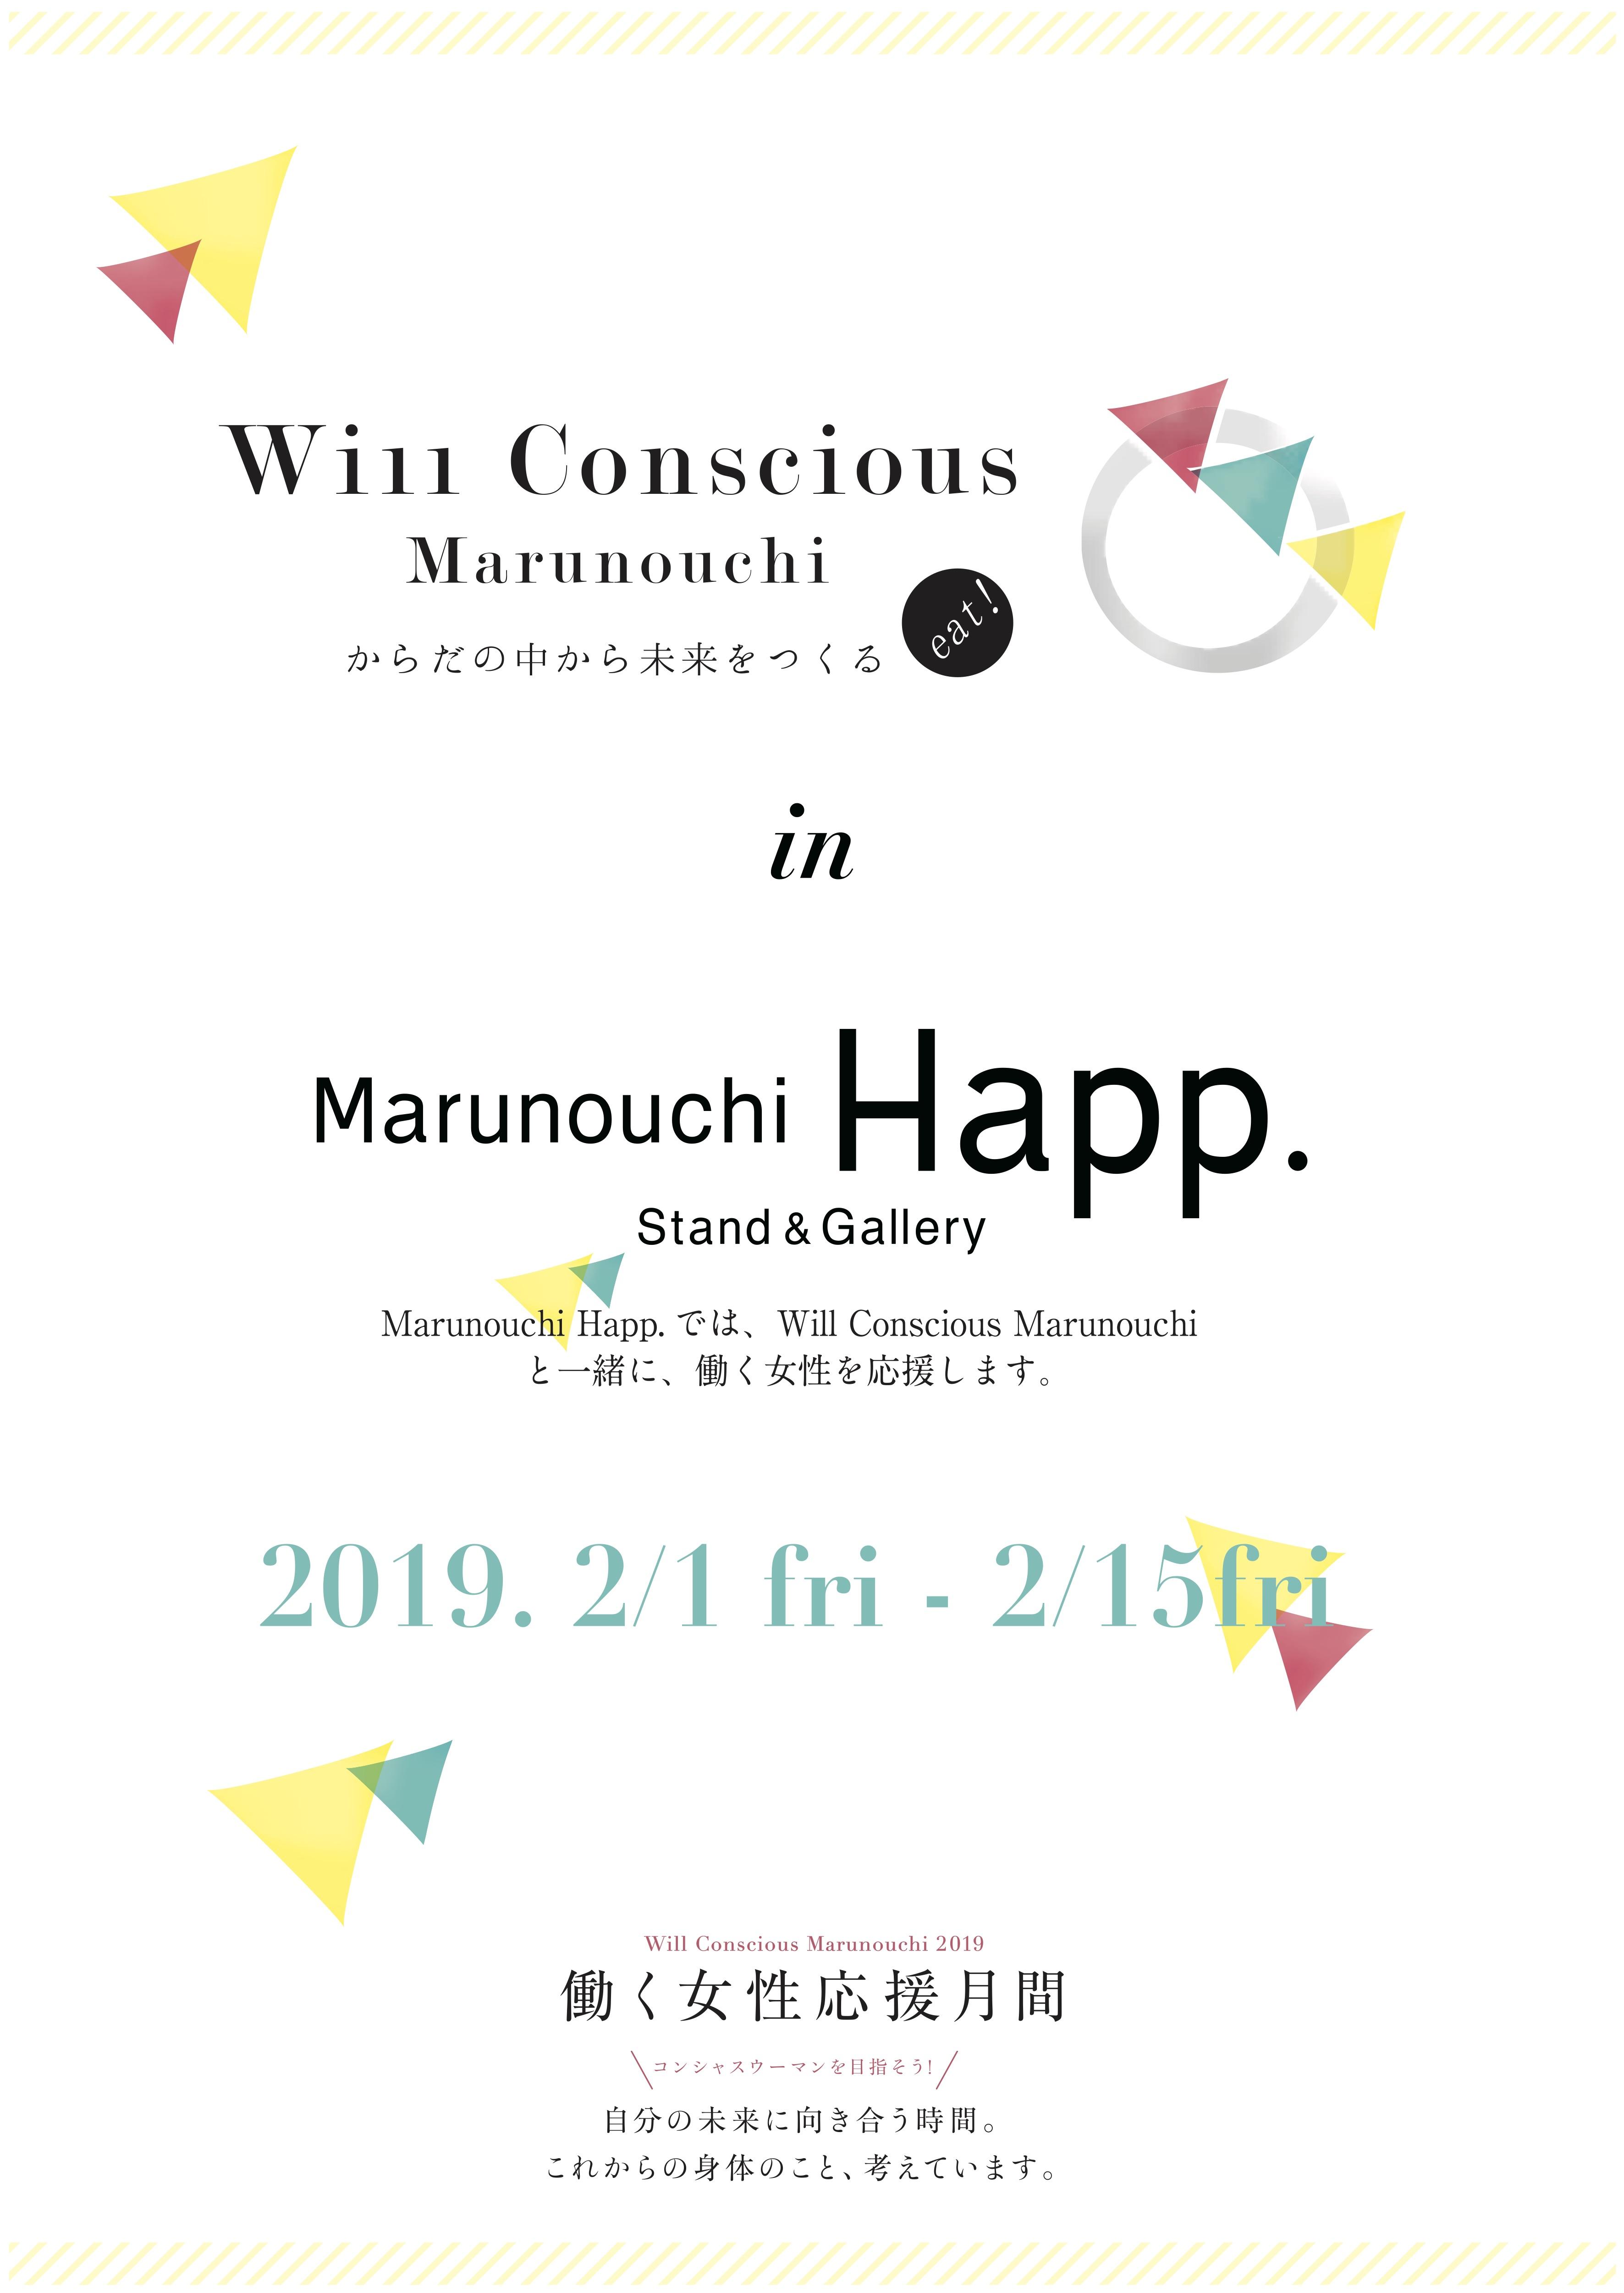 2/1(金)〜15(金)'Will Conscious Marunouchi in Marunouchi Happ.' 開催